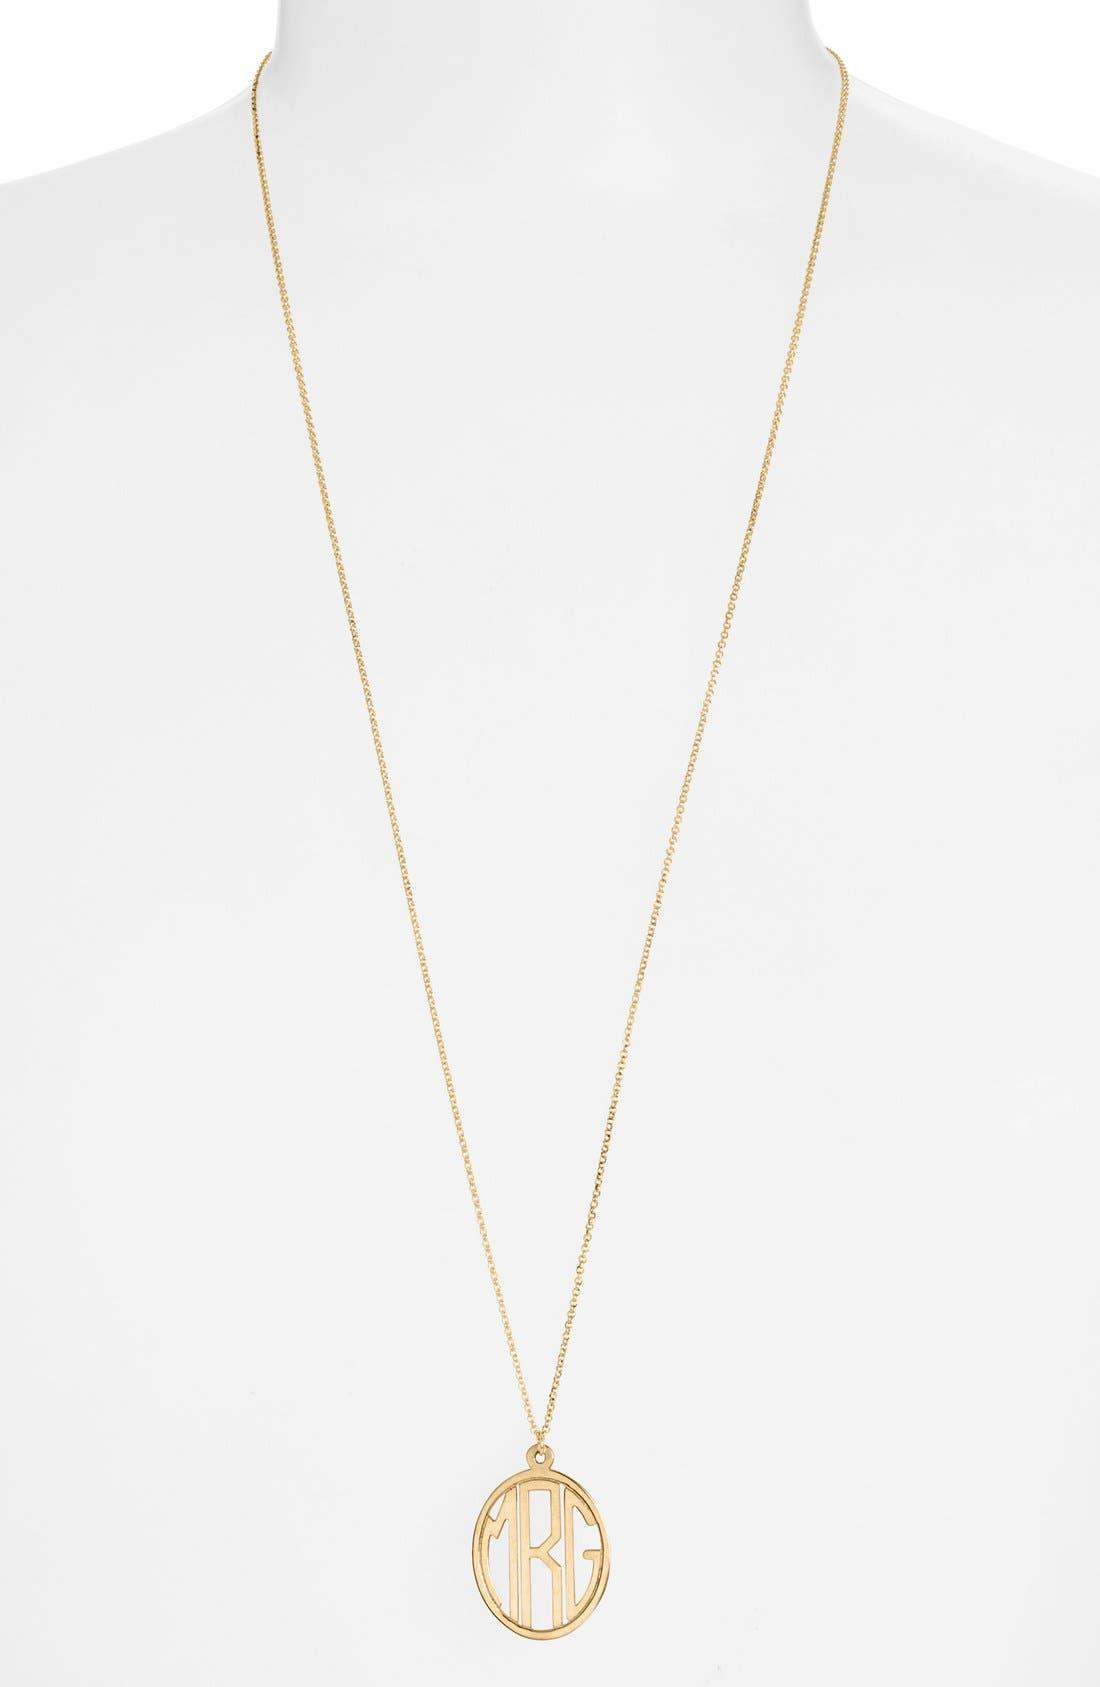 Personalized Monogram Pendant Necklace,                         Main,                         color, Gold